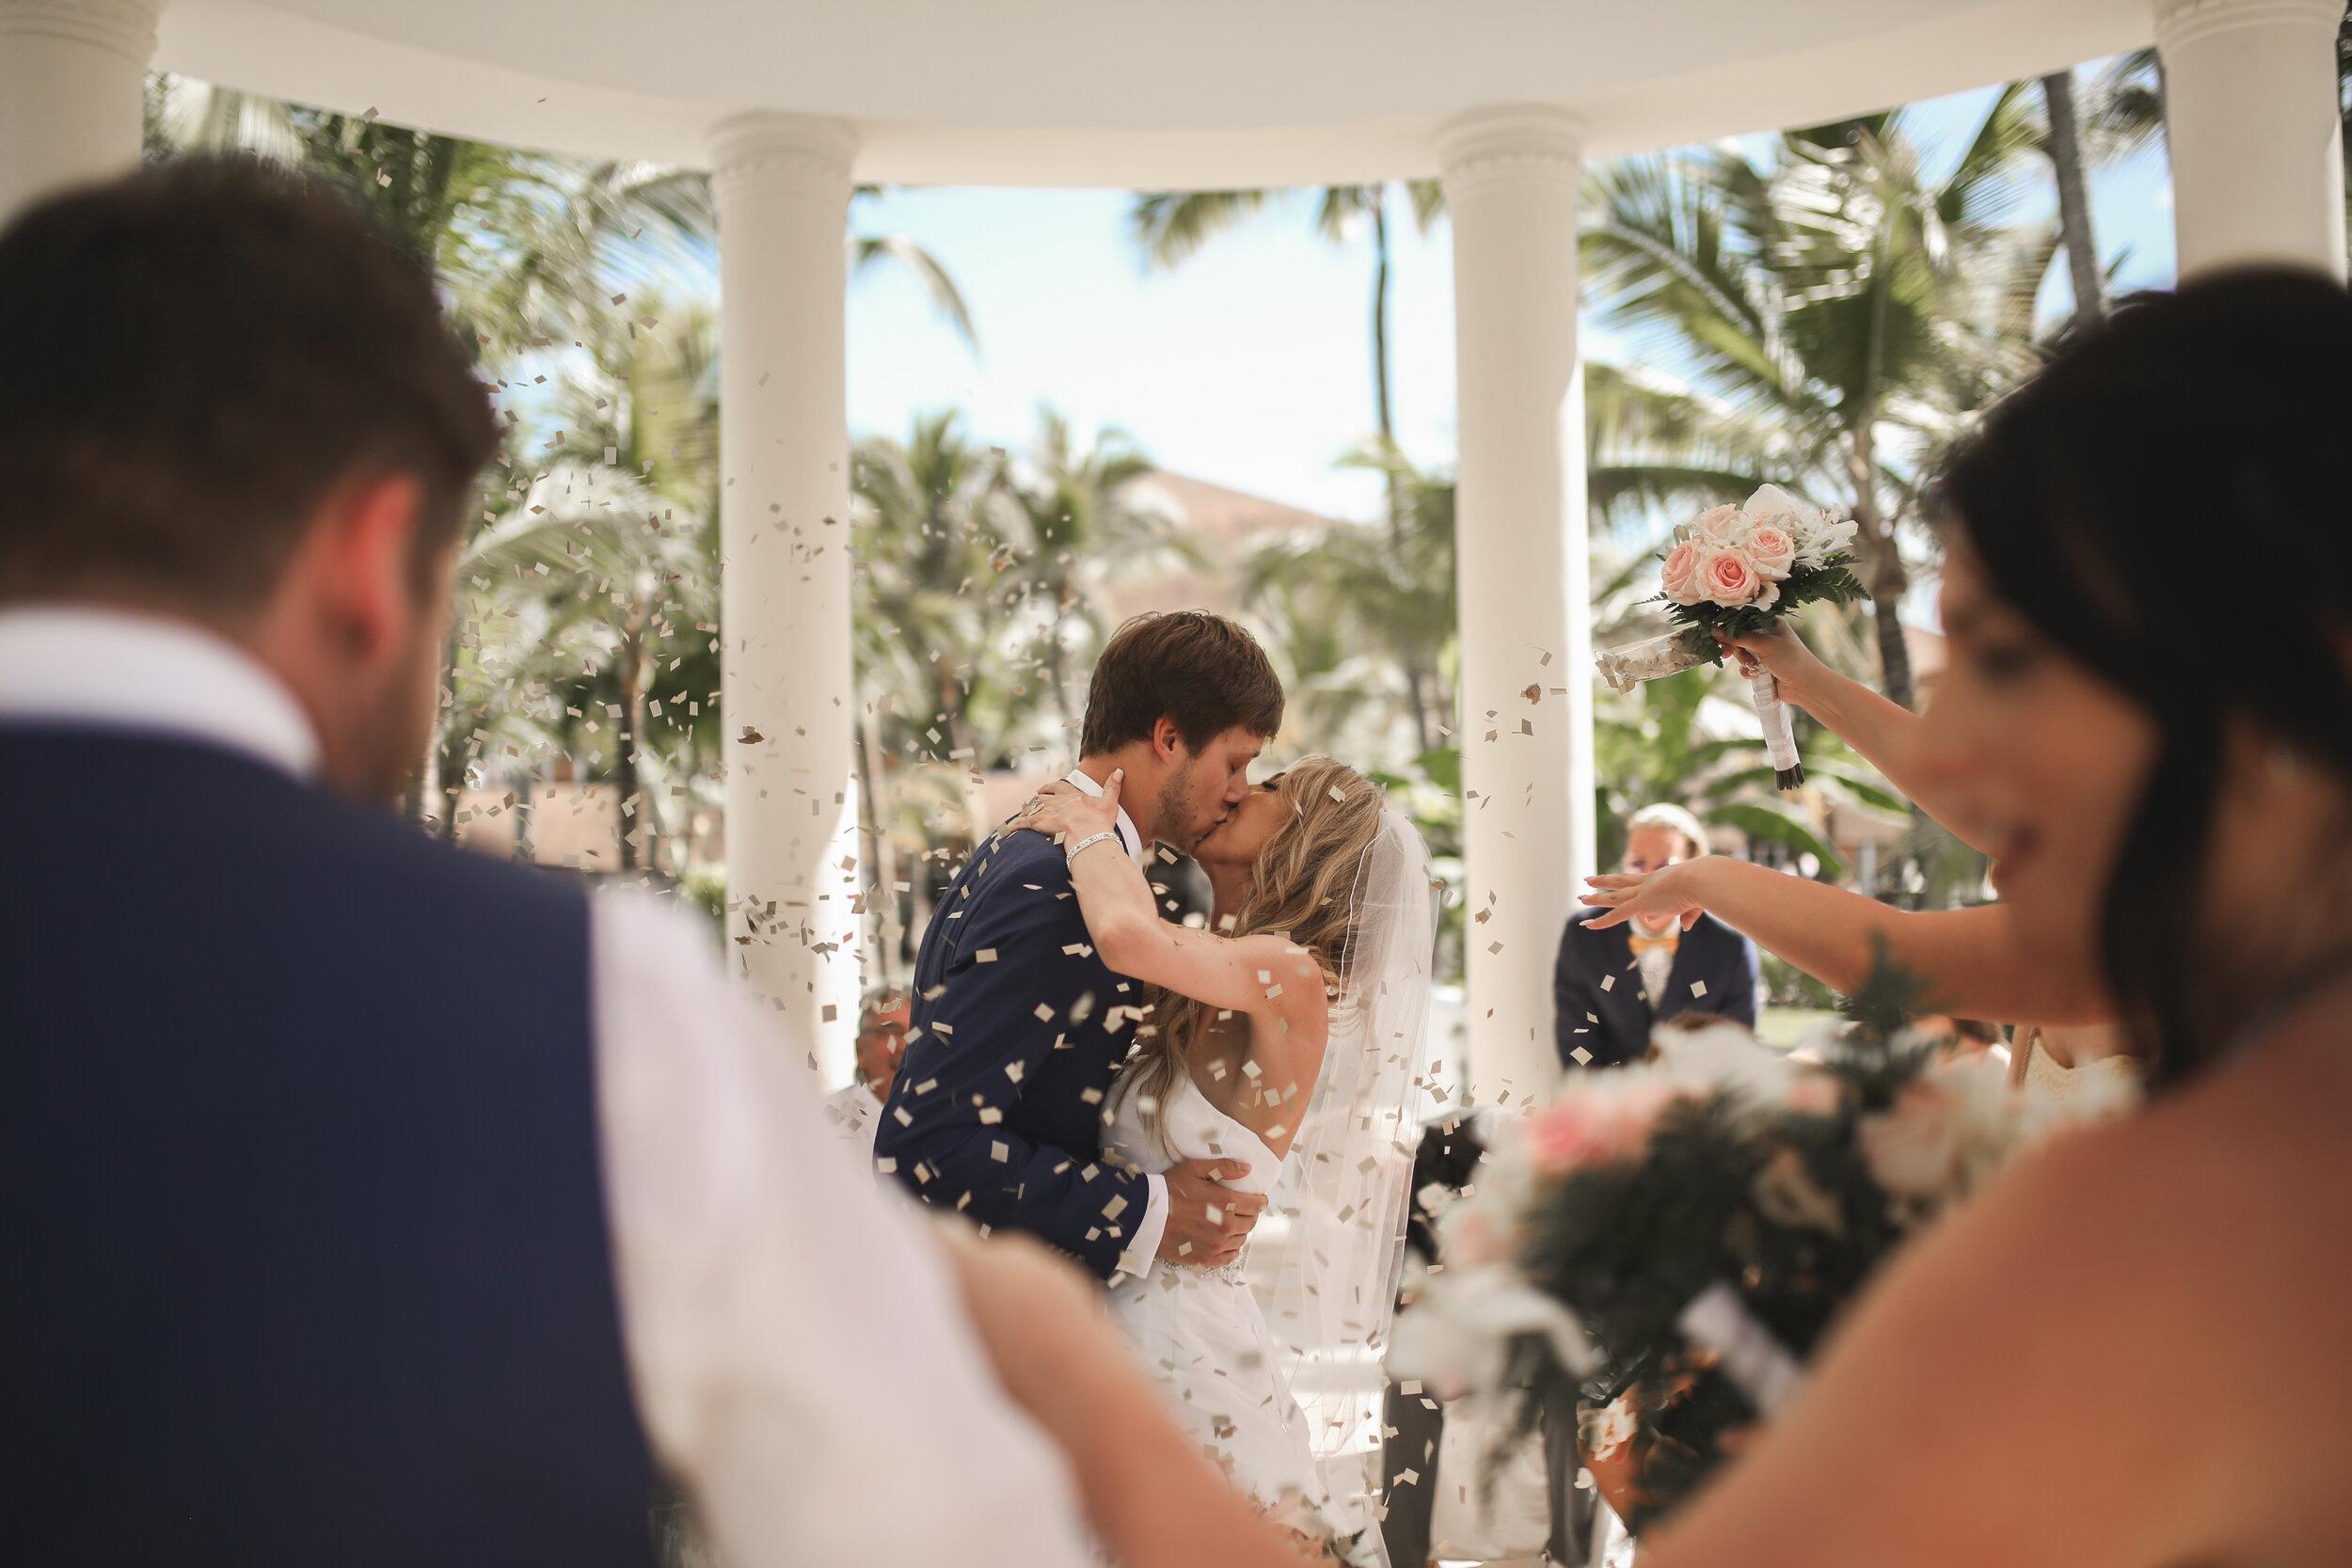 17 Adam Ziorio Photography - Aaron & Rhiannon Wedding.jpg